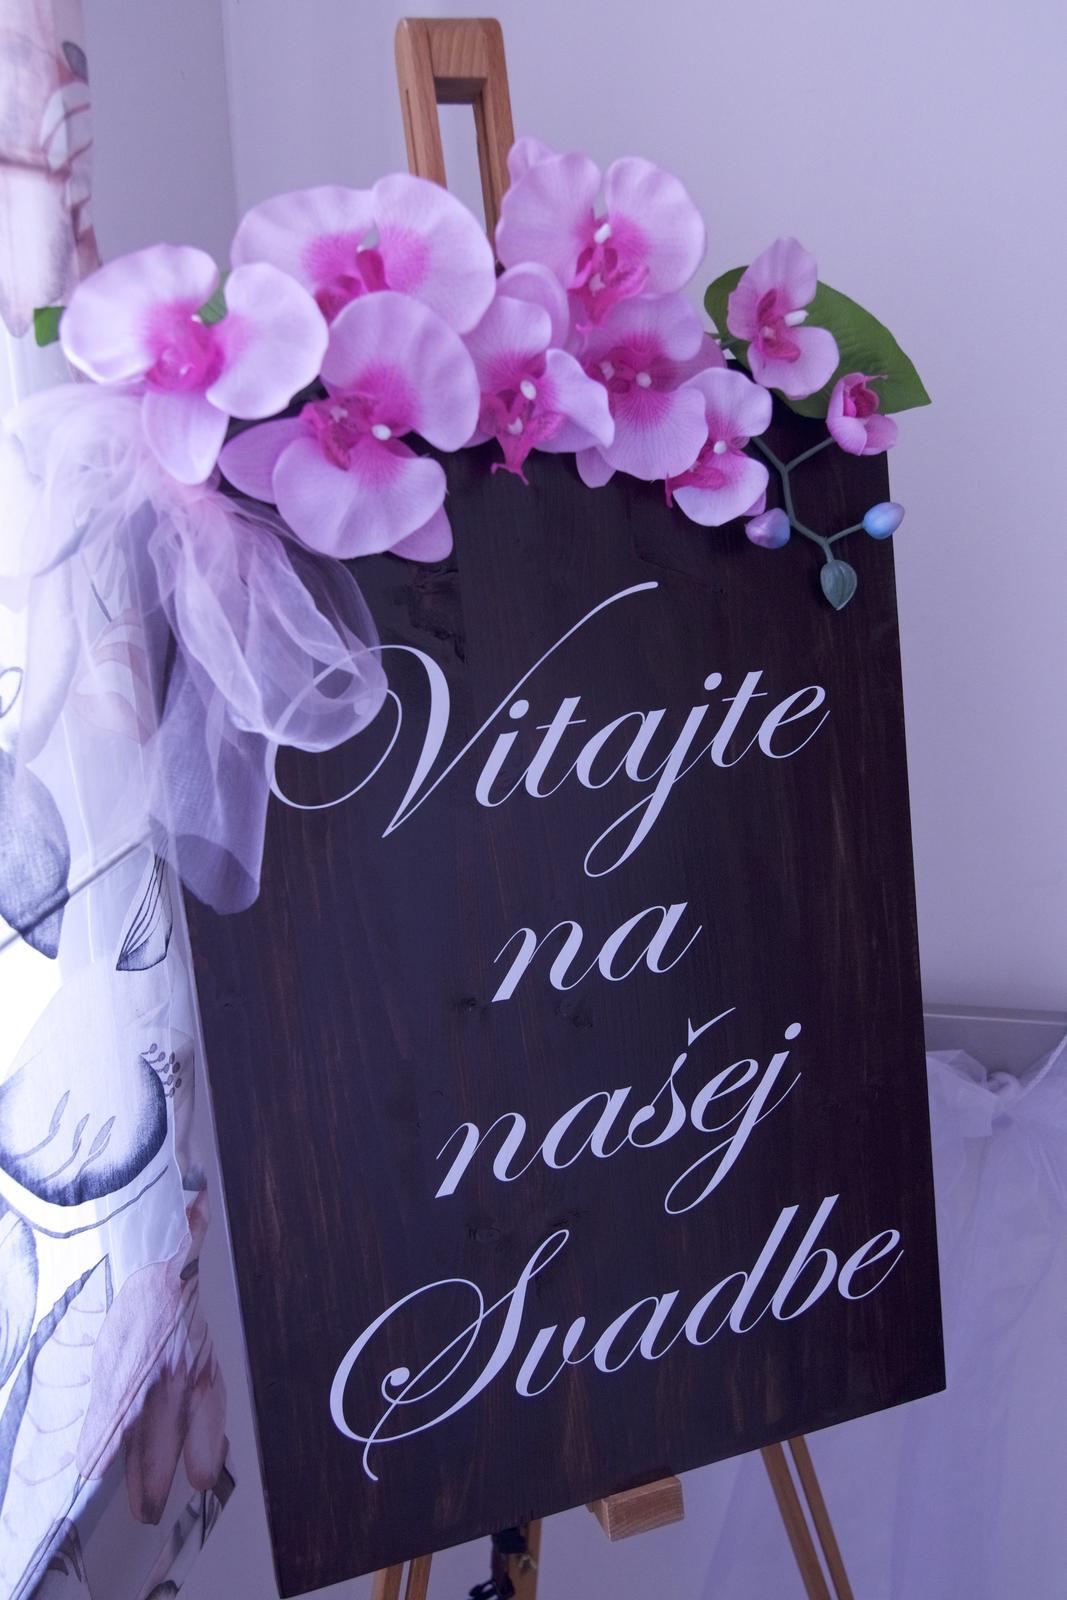 Welcome napis s kvetmi - Obrázok č. 2